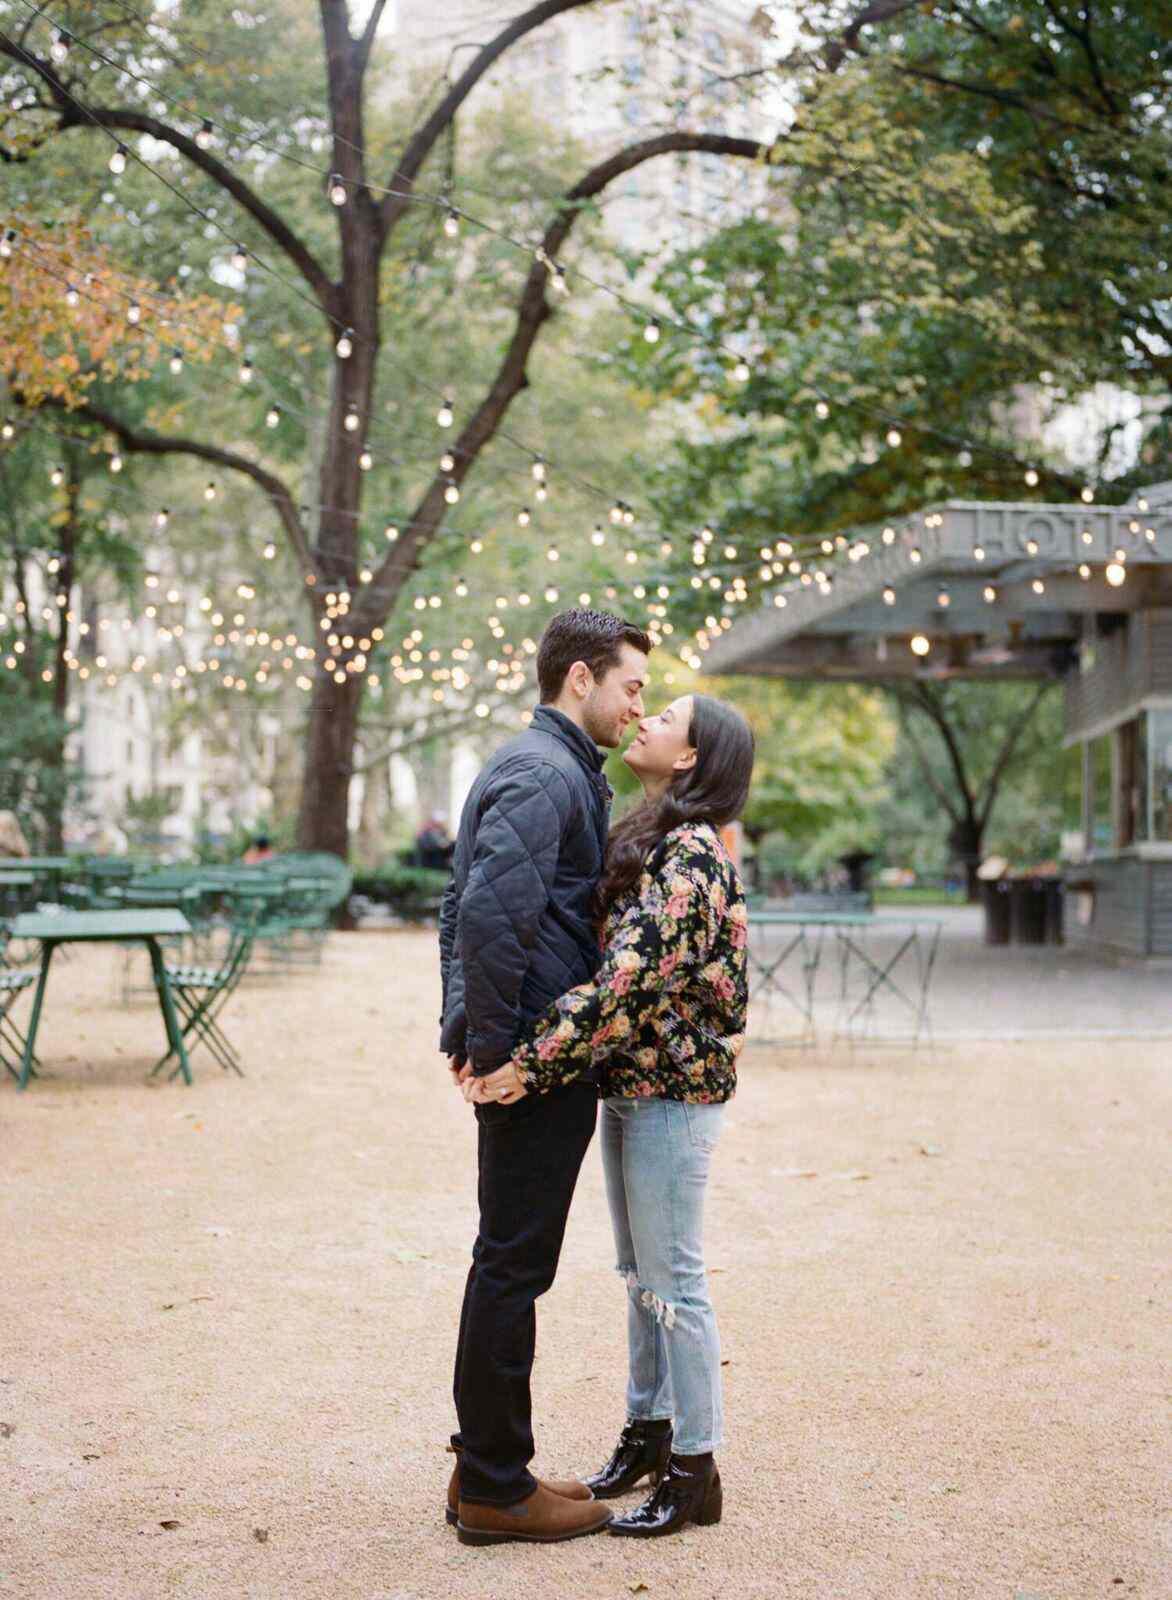 Couple posing in a courtyard